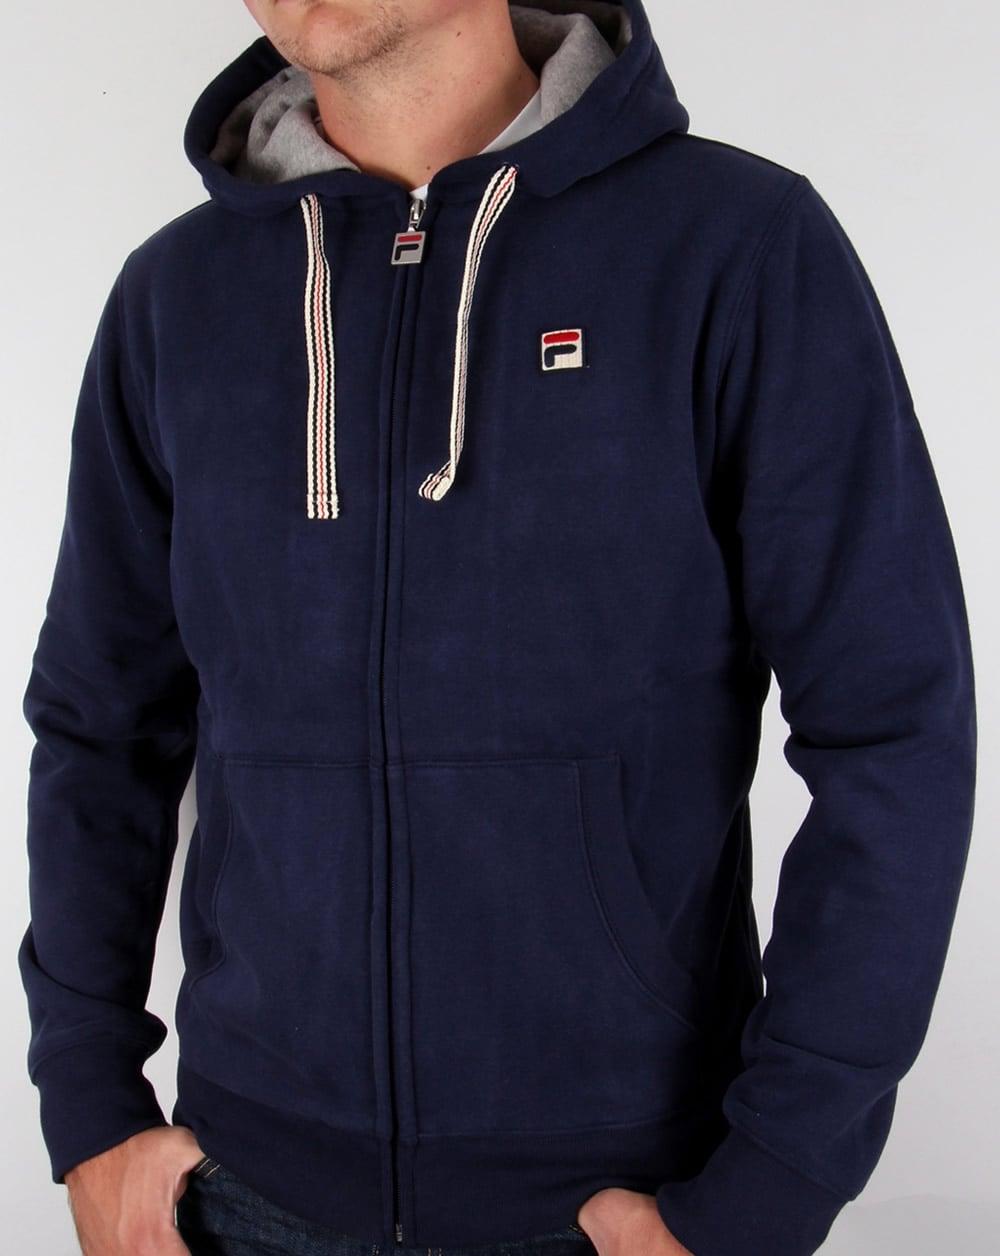 693cbadfb2a5d Fila Vintage Bagnoli Hoodie Navy,hooded,jacket,track,top,mens